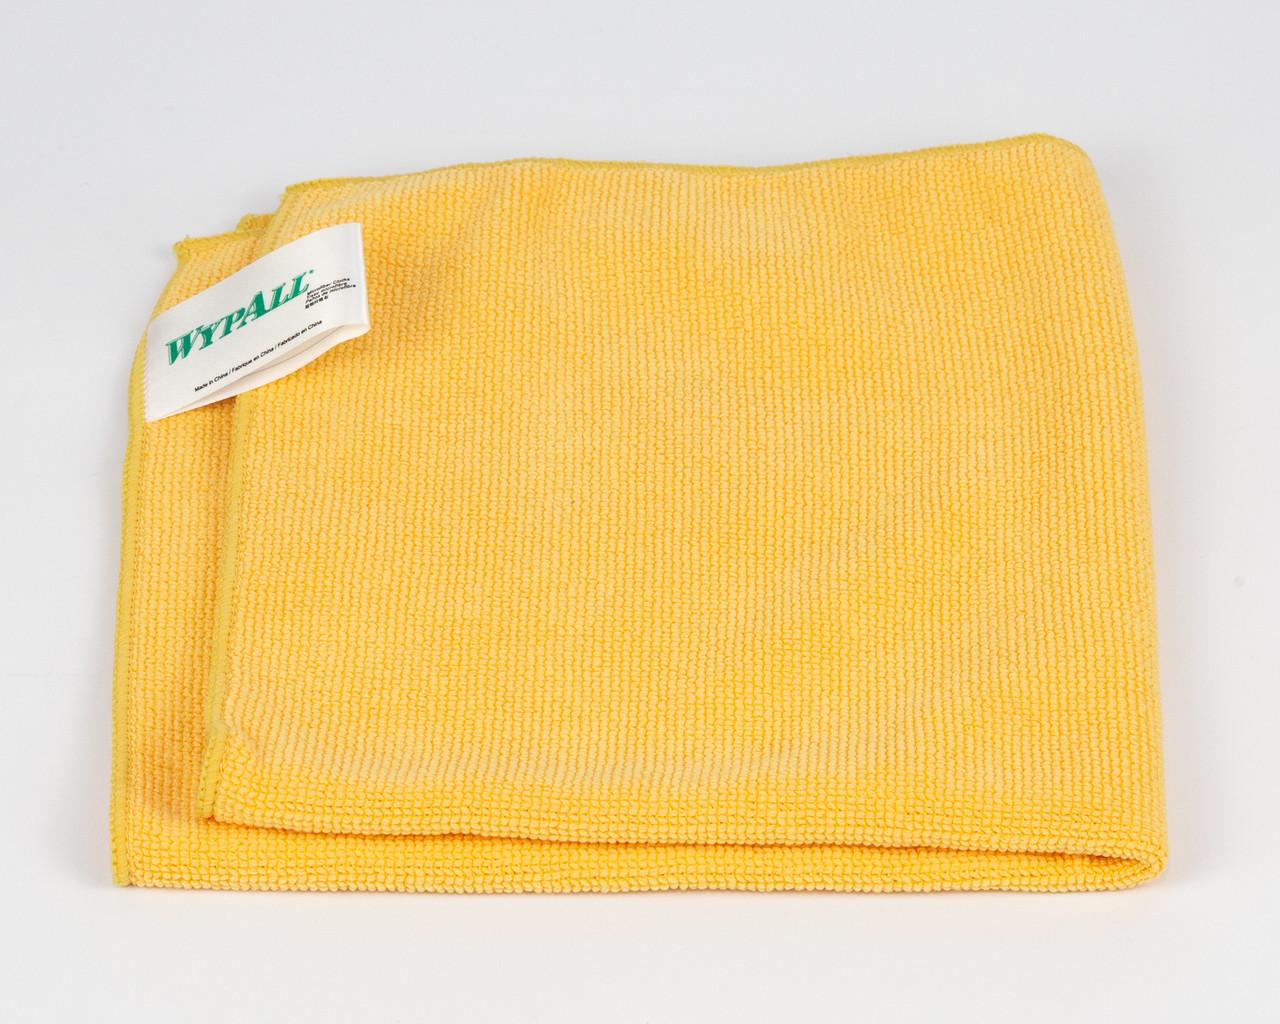 Серветка мікрофибра універсальна  Wypall, 40х40см, жовта.